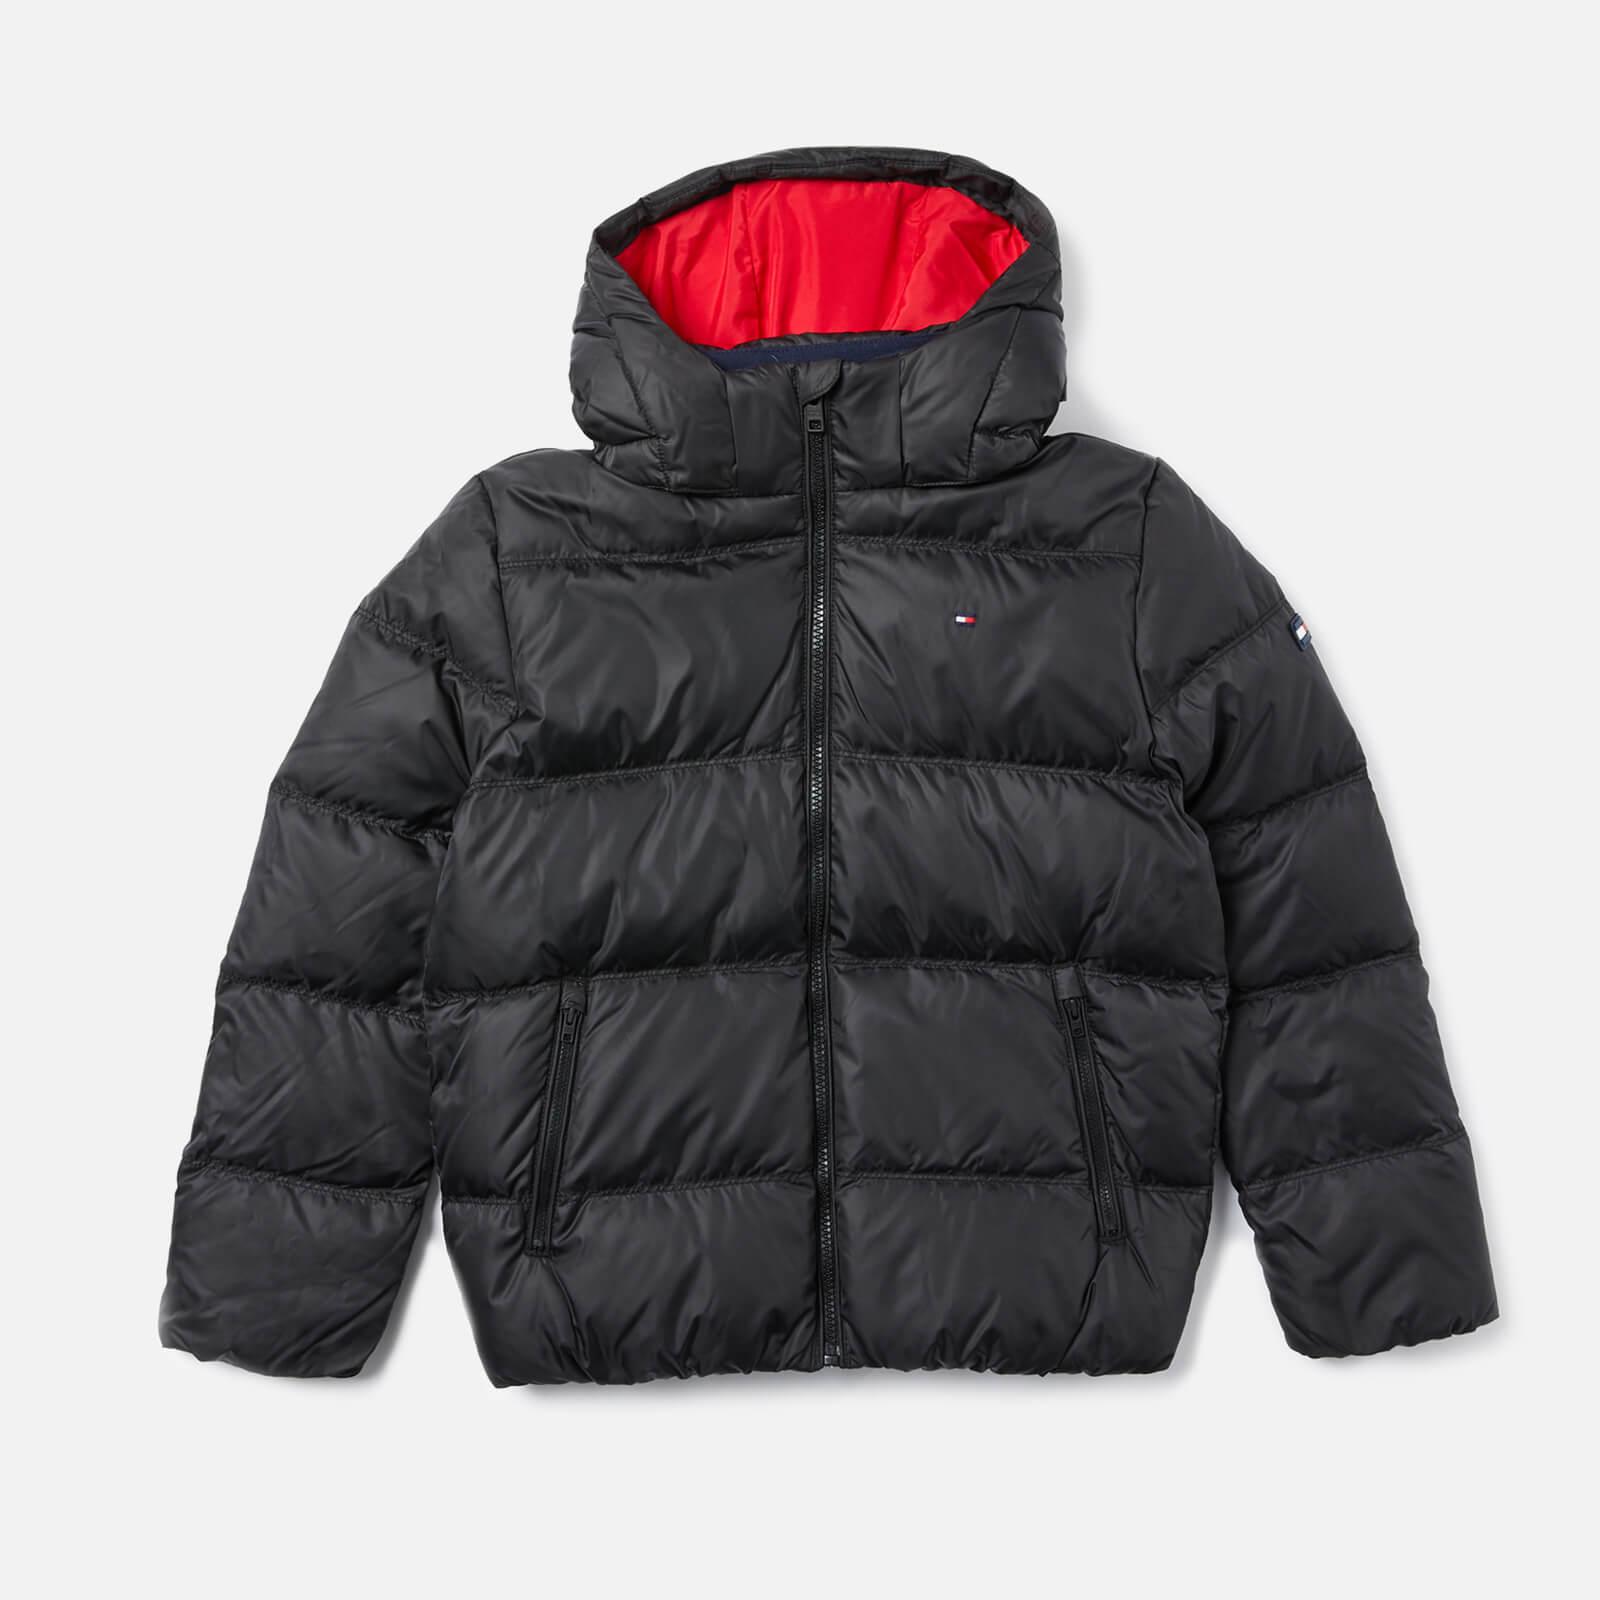 e4673859 Tommy Hilfiger Boys' Essential Basic Padded Jacket - Tommy Black Clothing |  TheHut.com